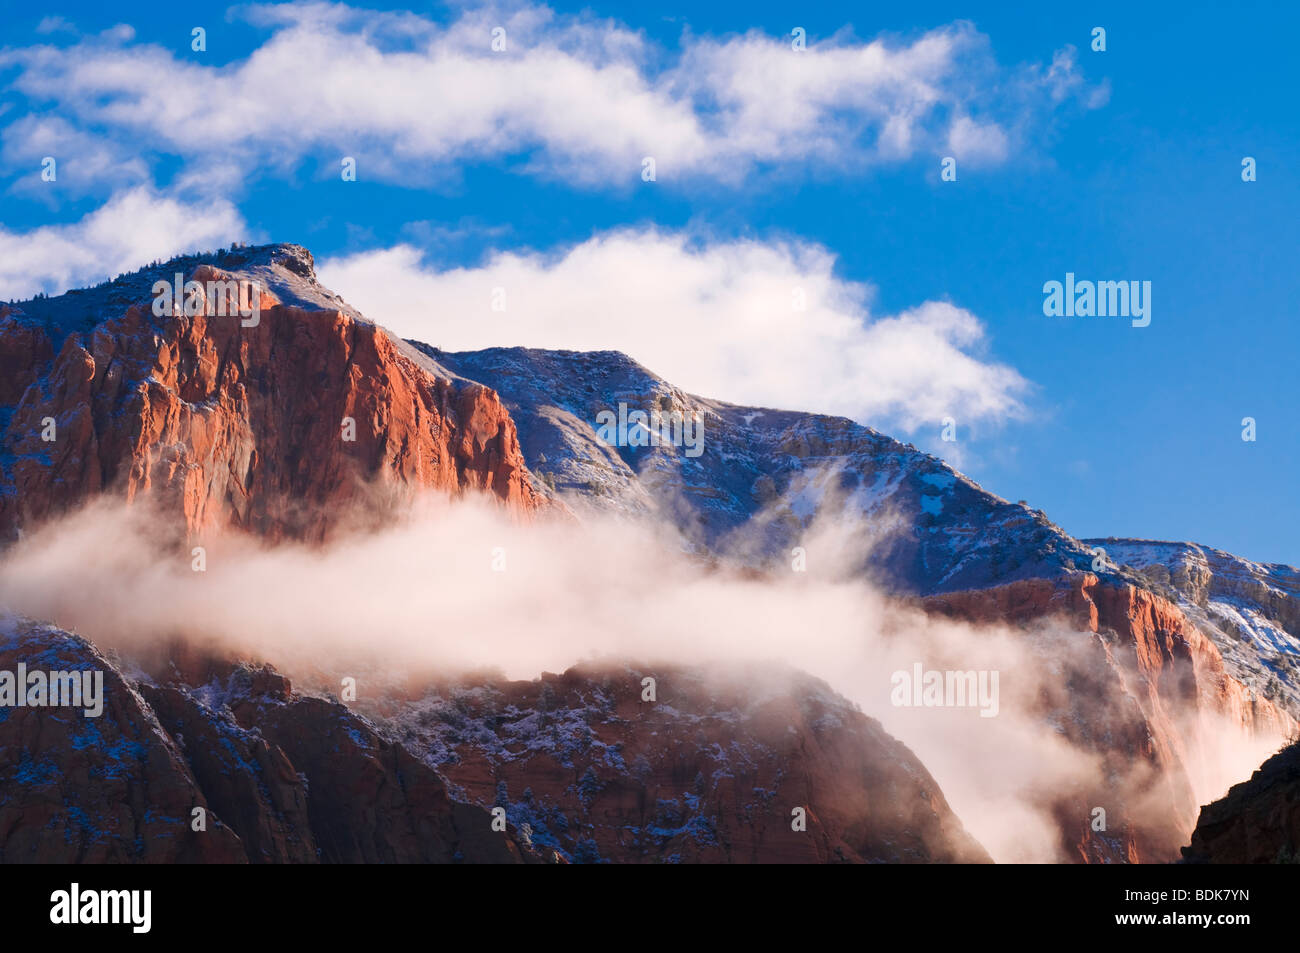 Fresh snow at dawn on the Kolob Canyons, Zion National Park, Utah Stock Photo